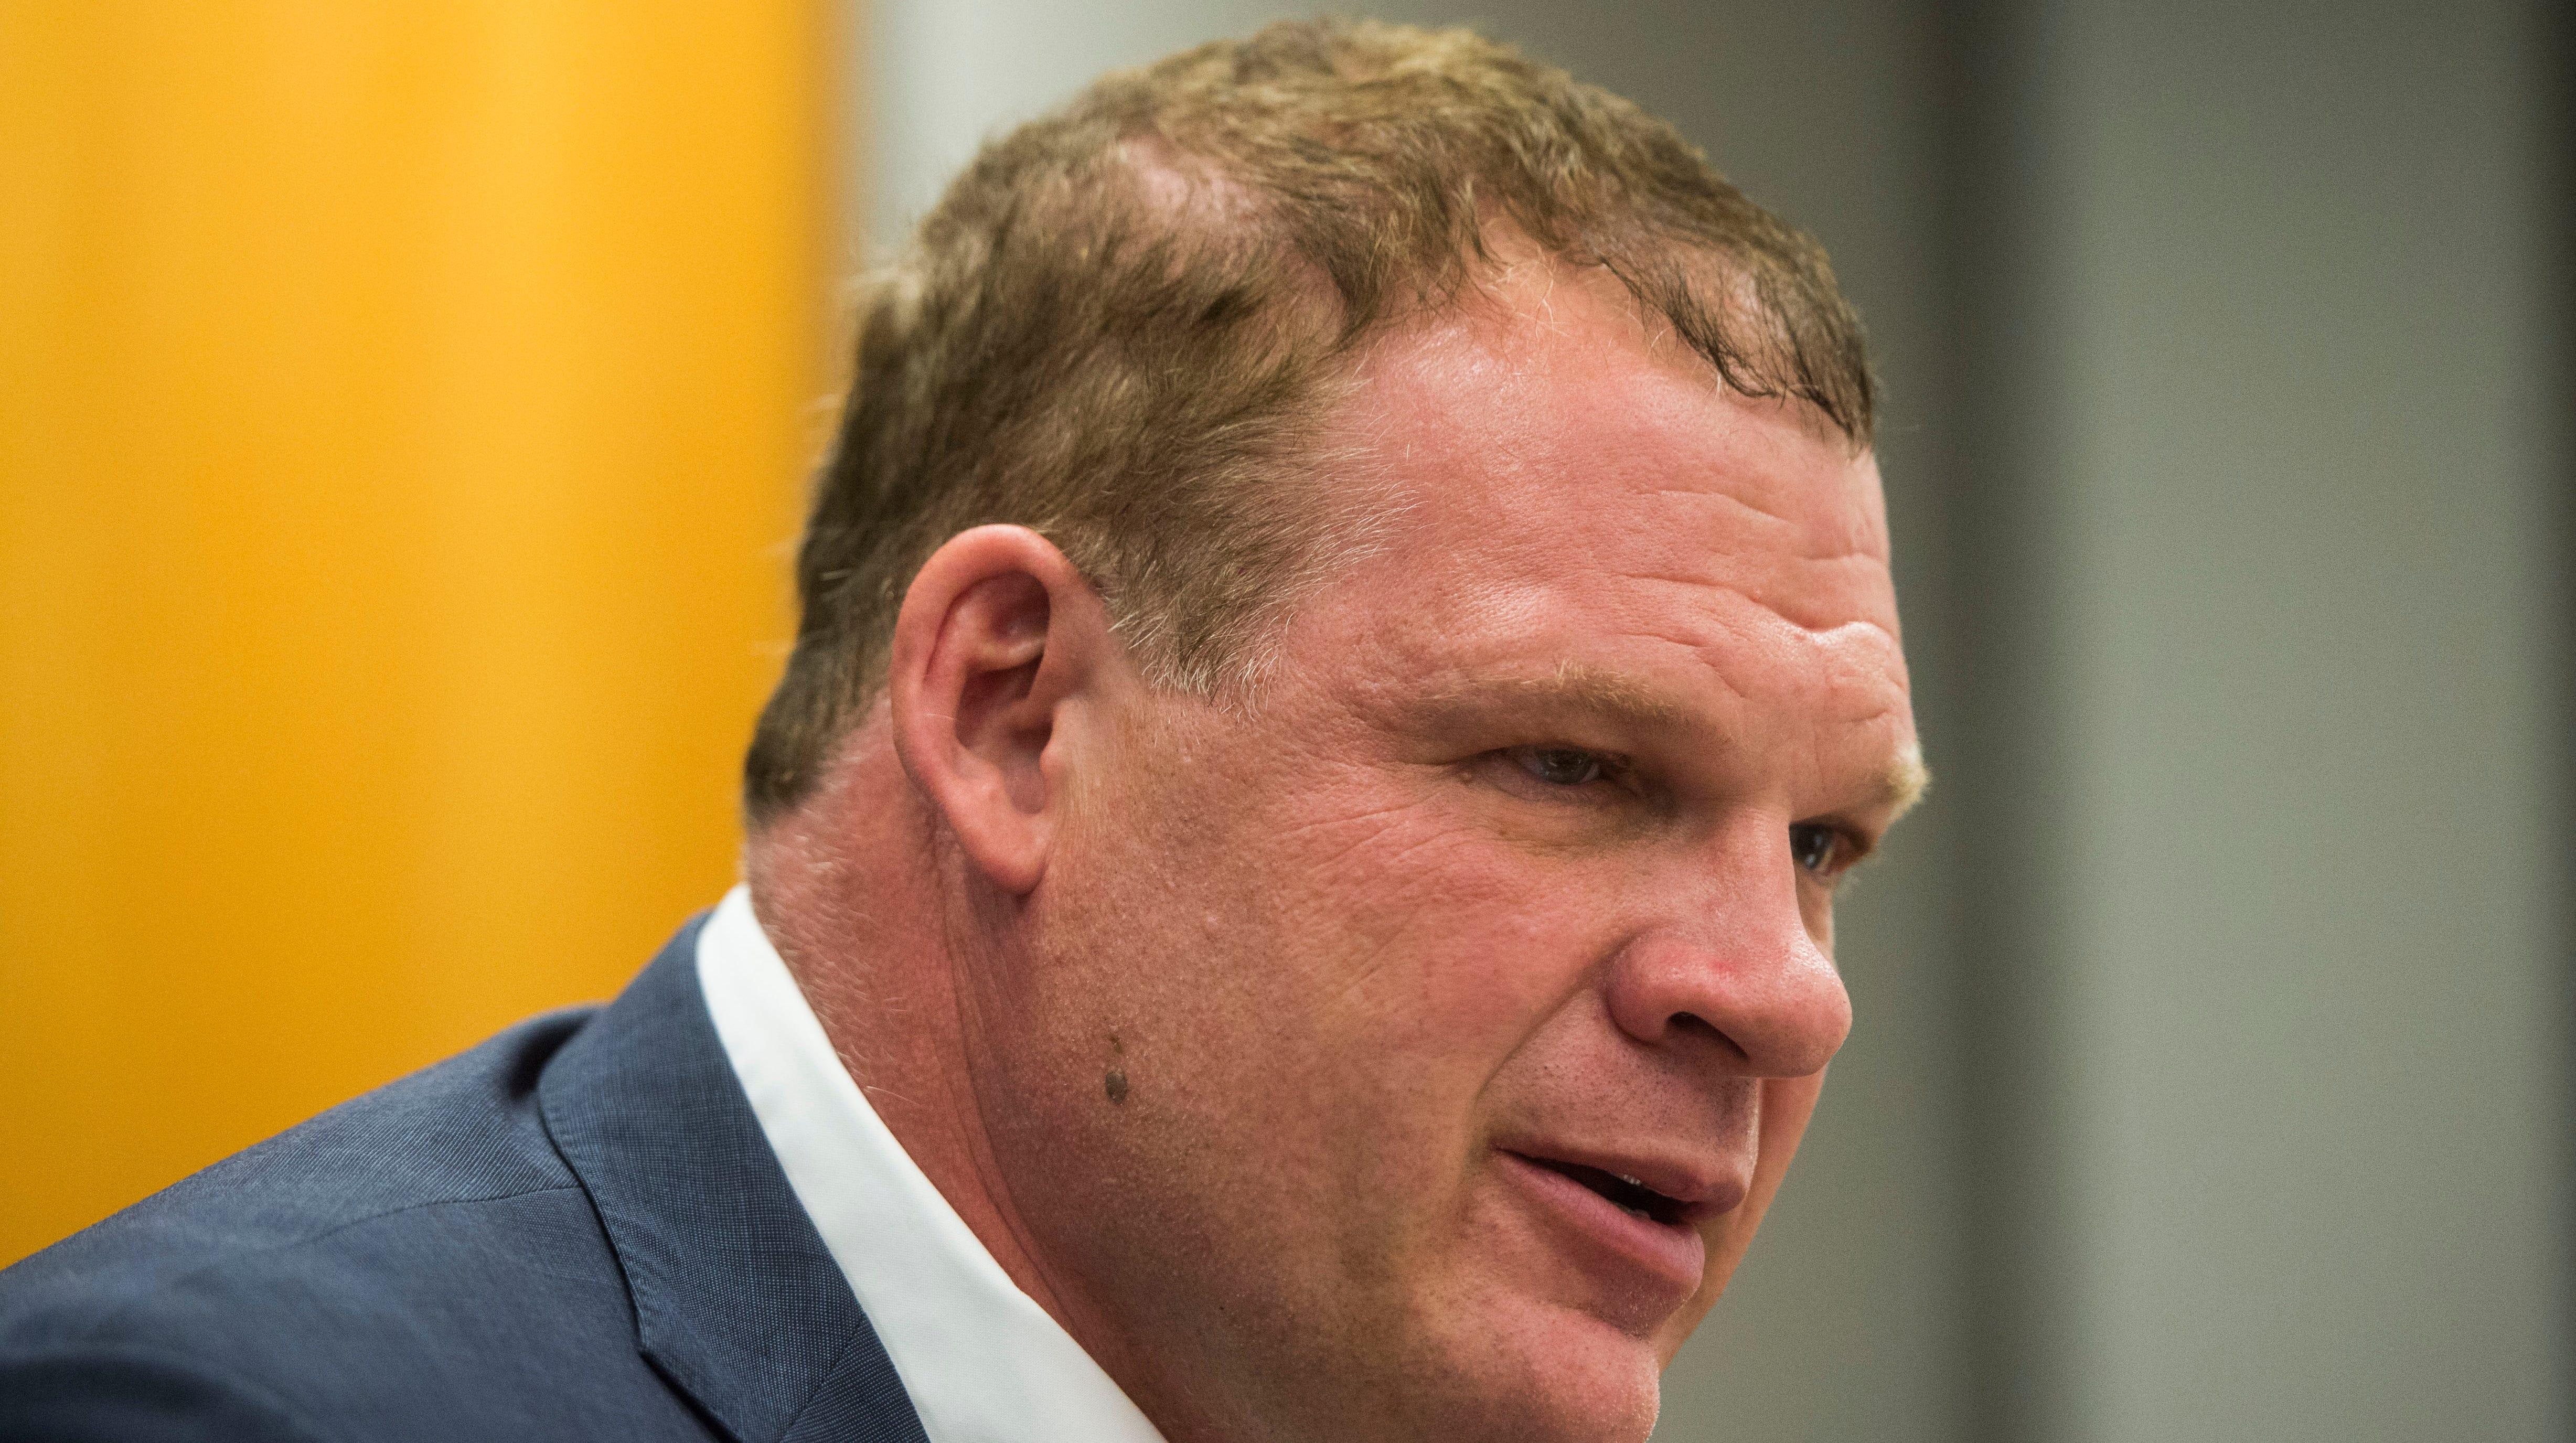 Knox Mayor Jacobs, aka wrestler 'Kane,' says he's never